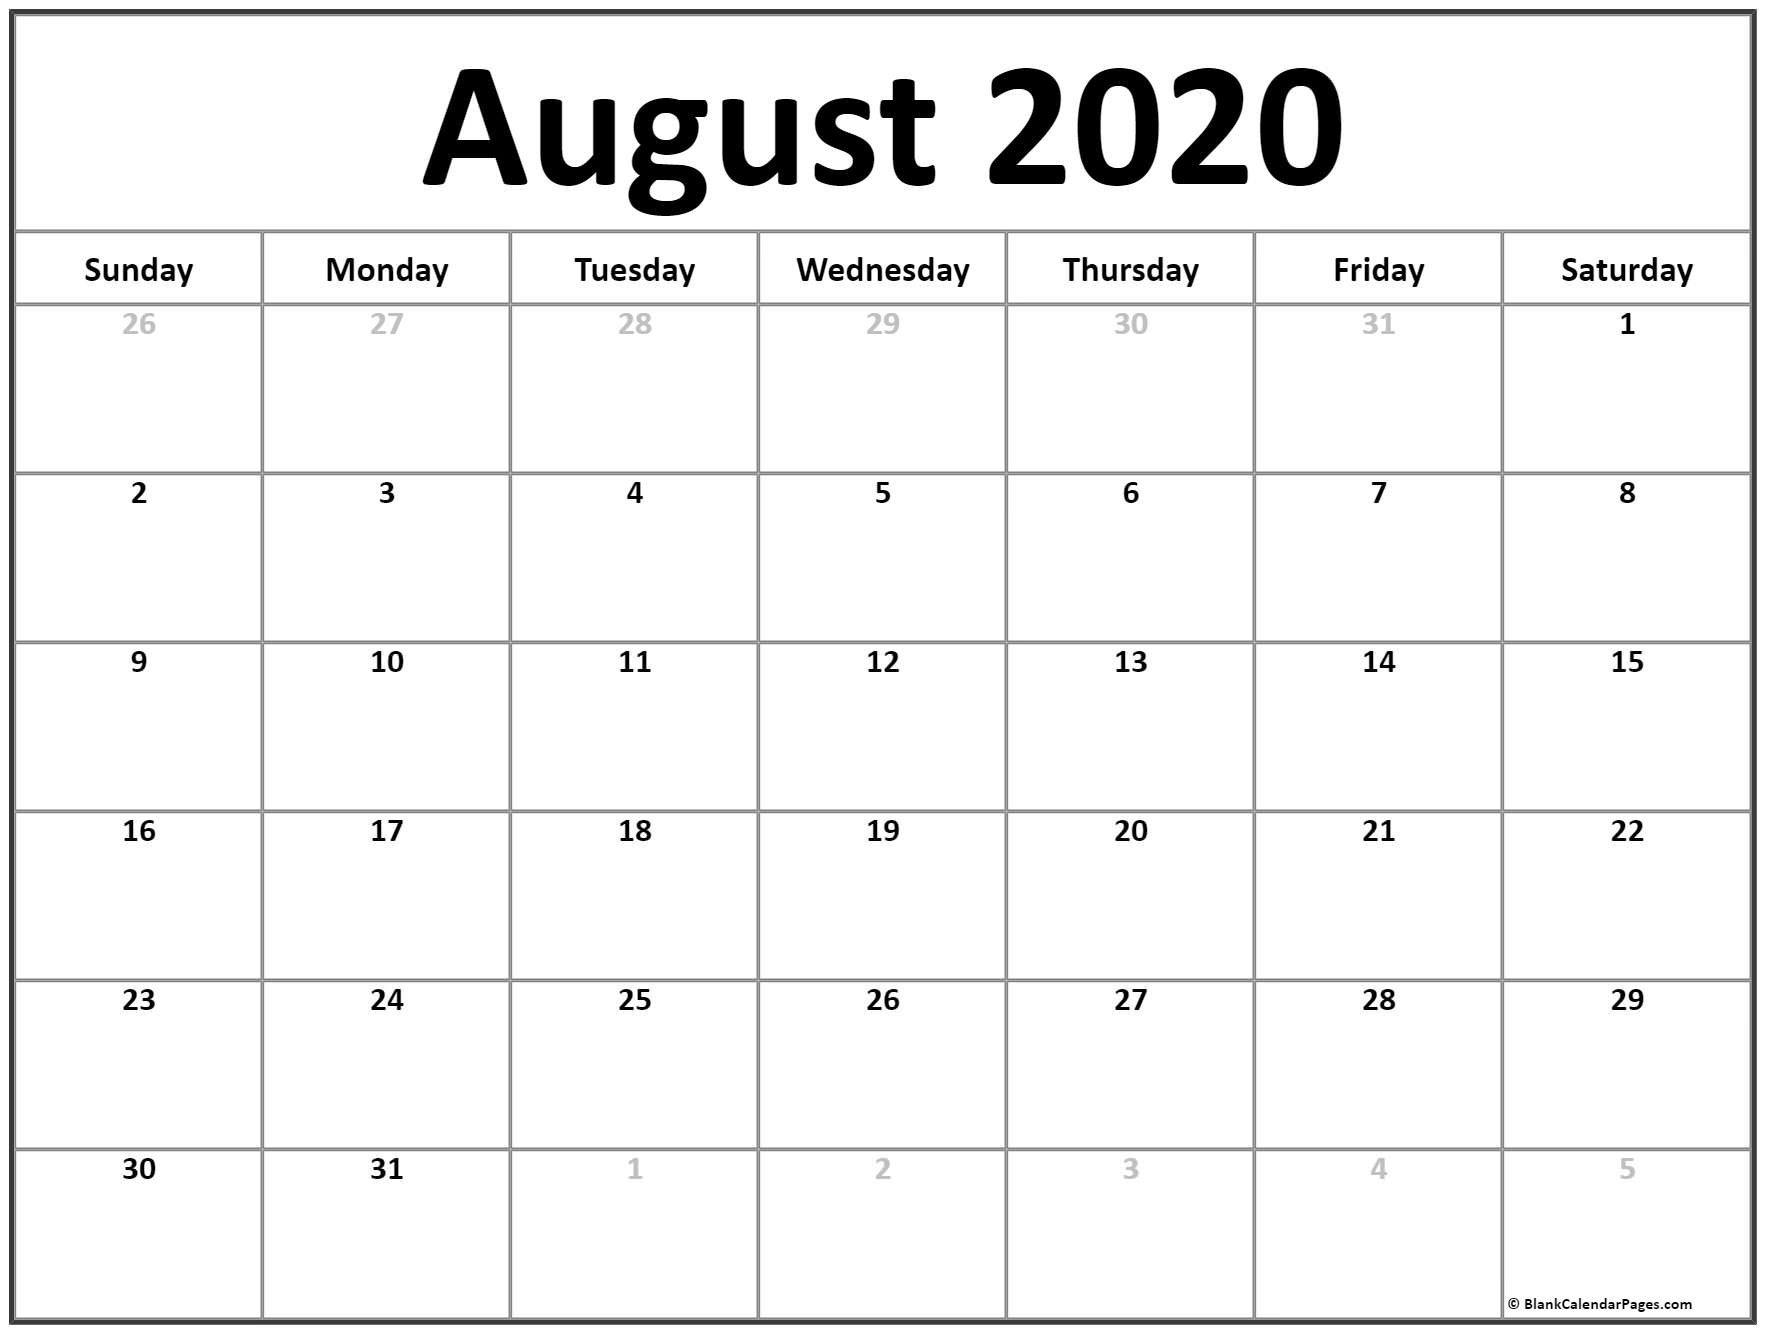 August 2020 Calendar | Free Printable Monthly Calendars Small Printable Blank Calendar